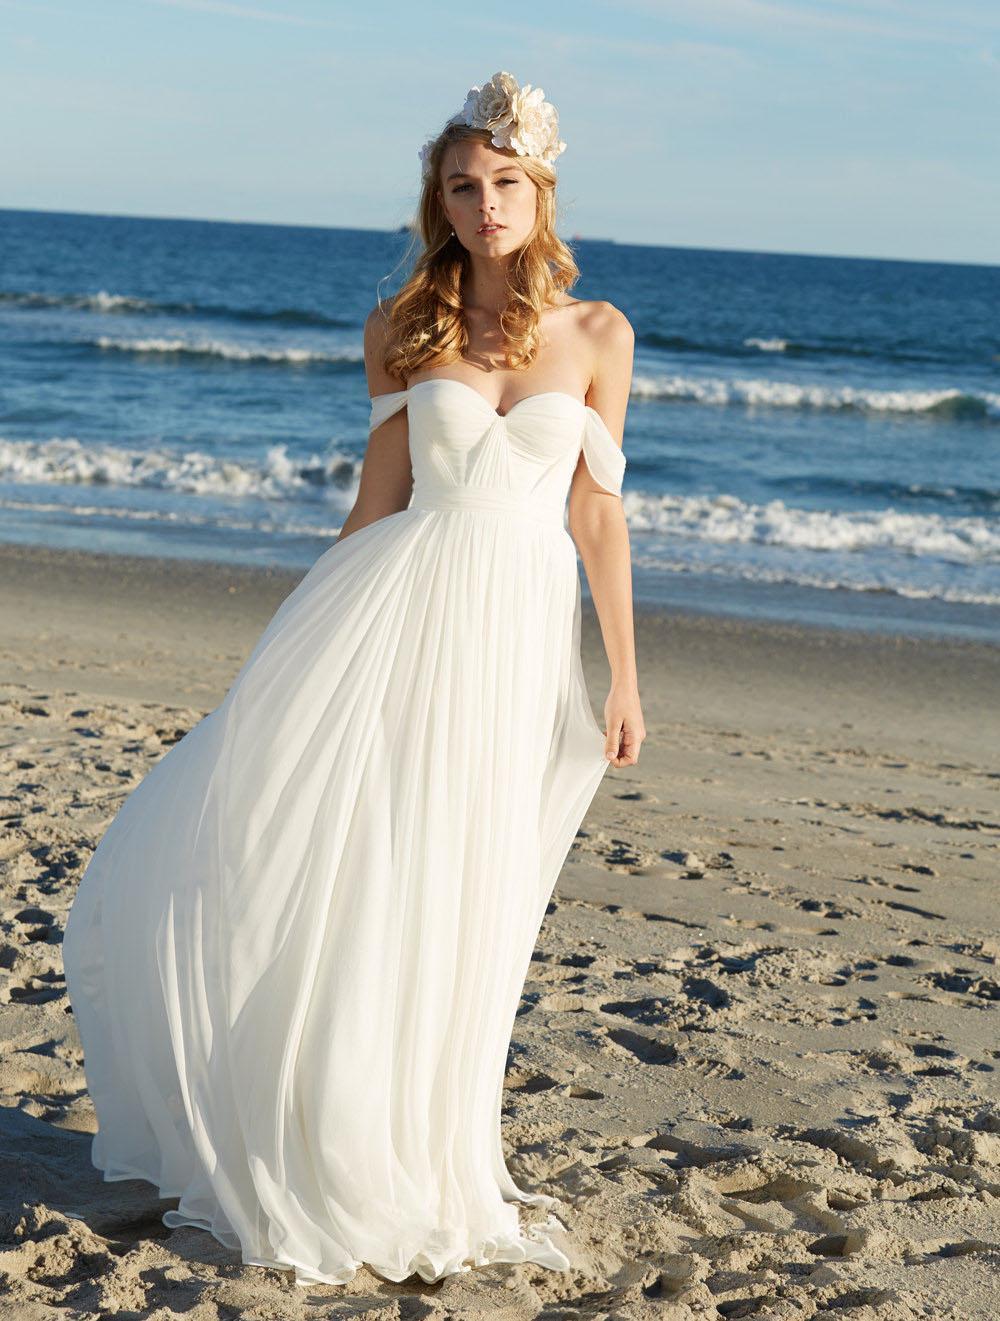 Beach Wedding Dress A-line White Off Shoulder Ruched Chiffon Long ...